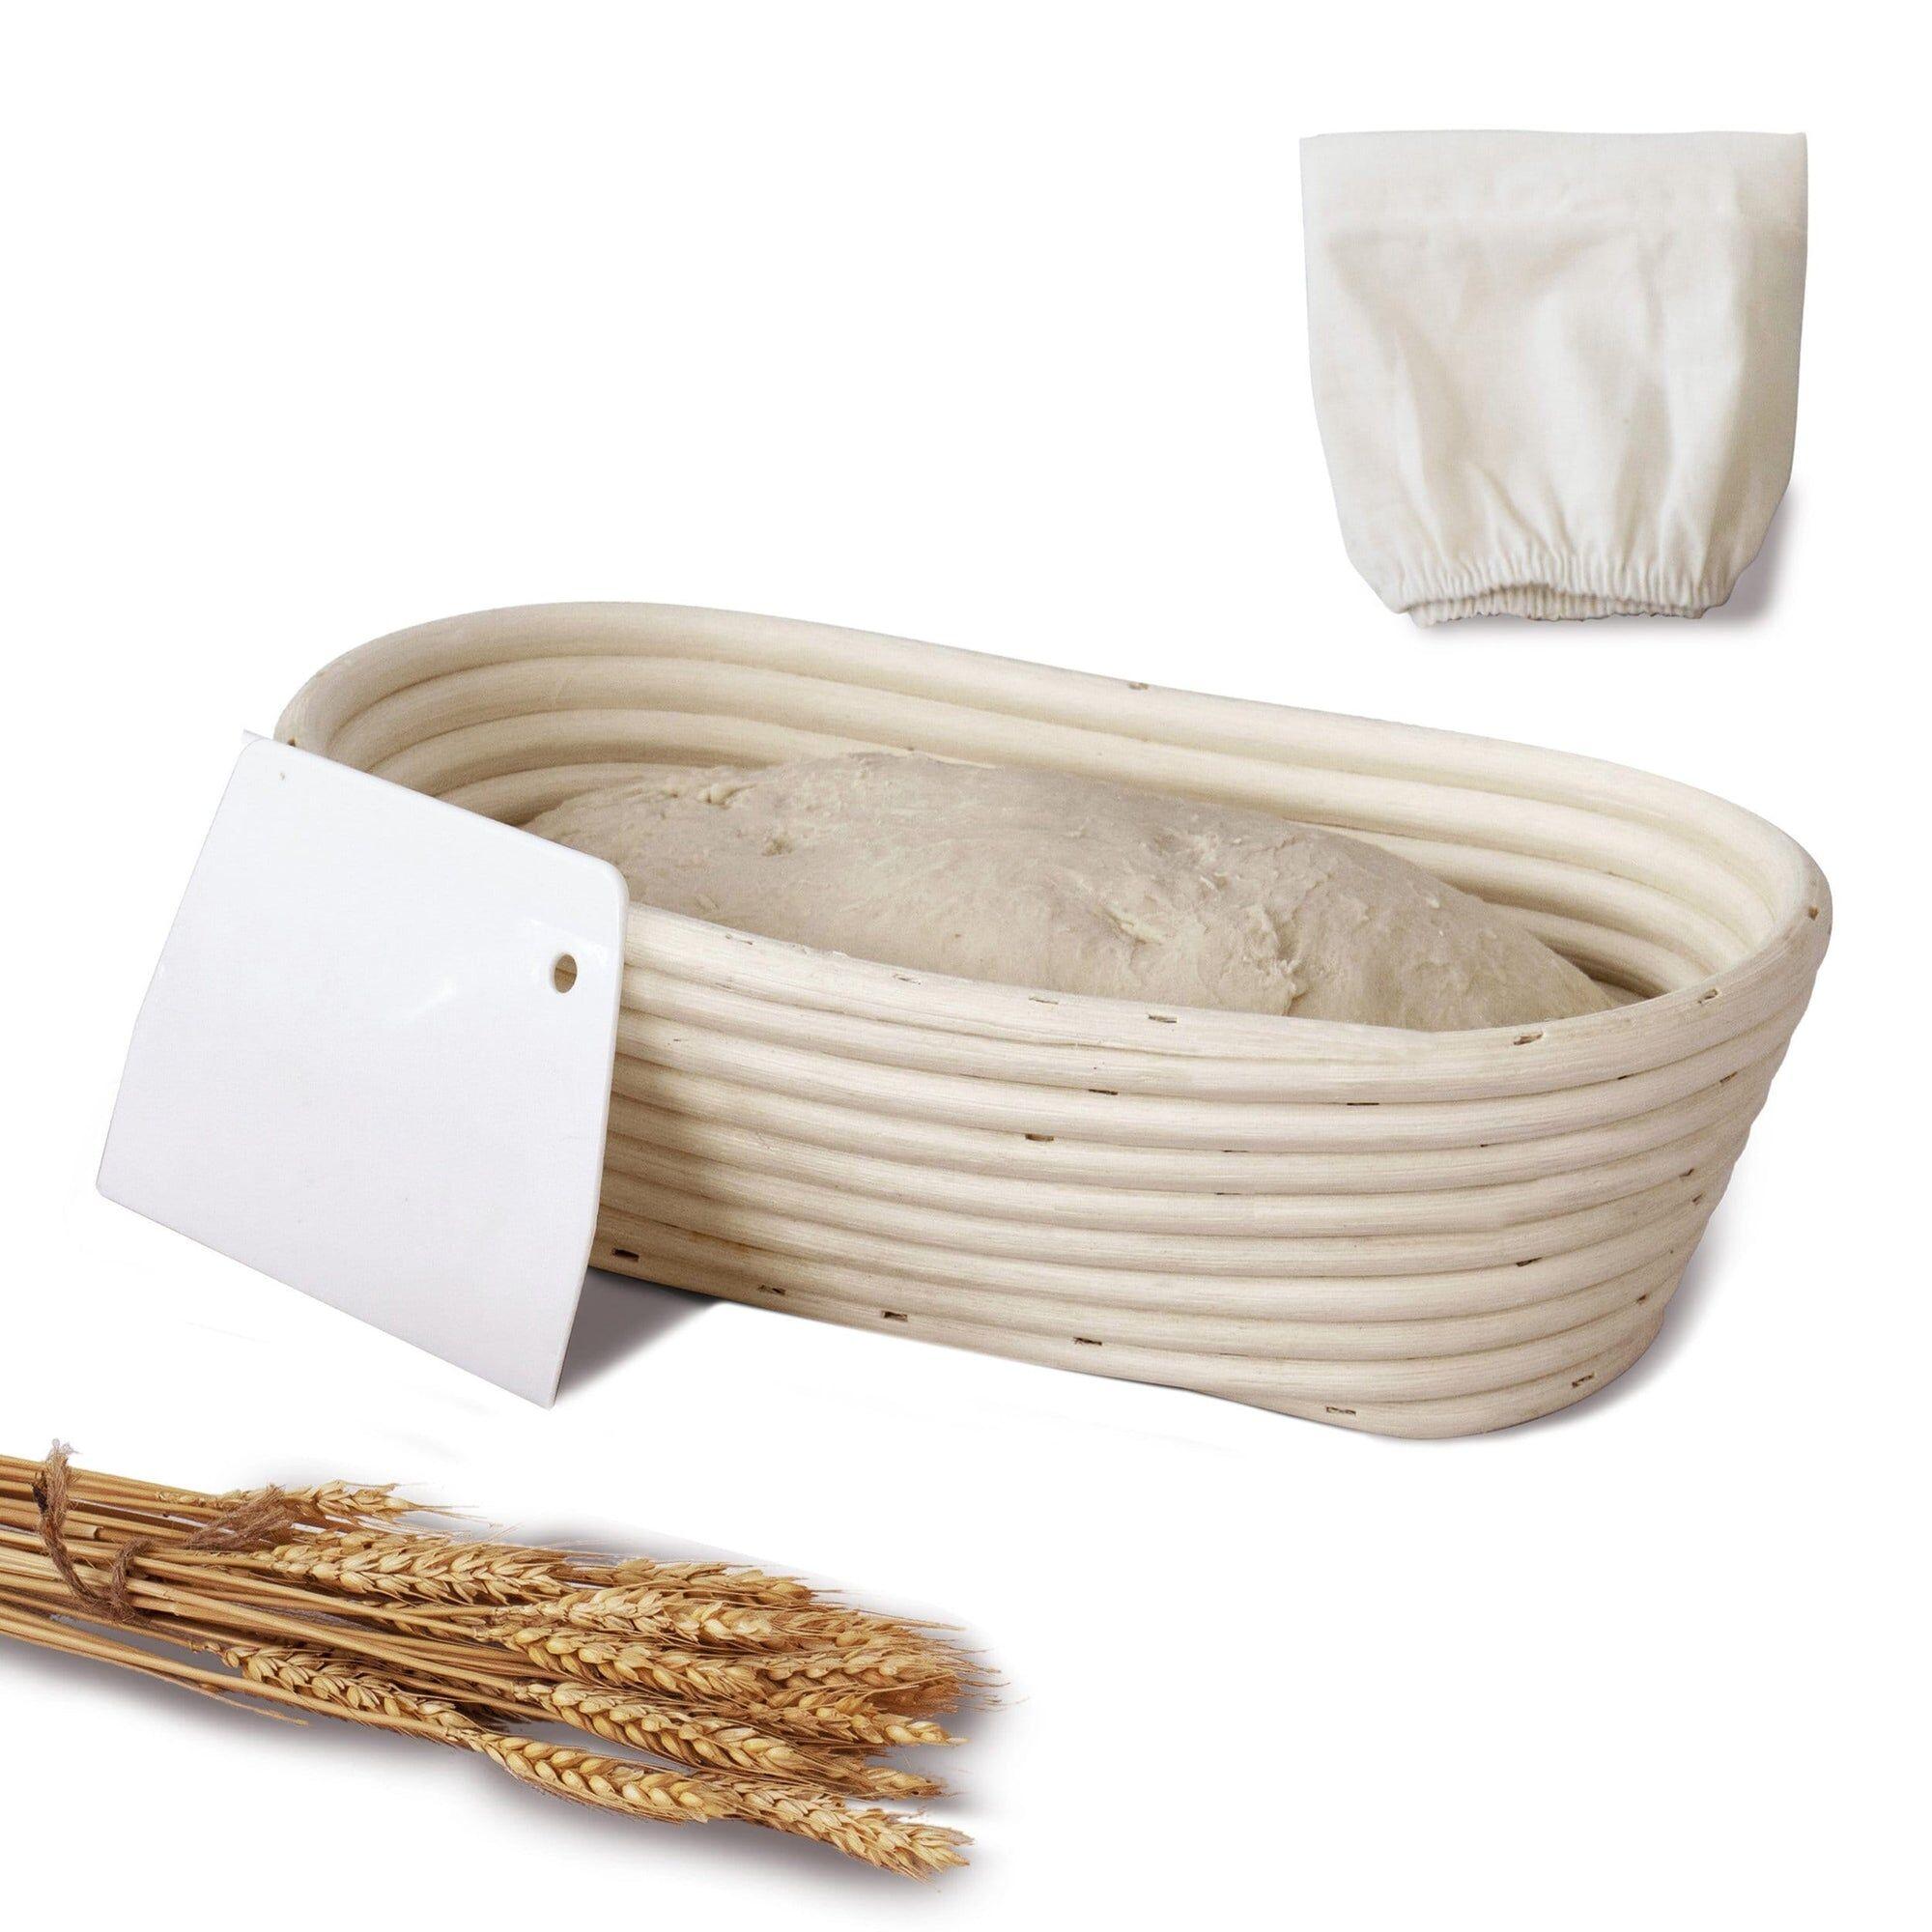 MadeTerra 10-inch Oval Rattan Banneton Bread Proofing Basket Set